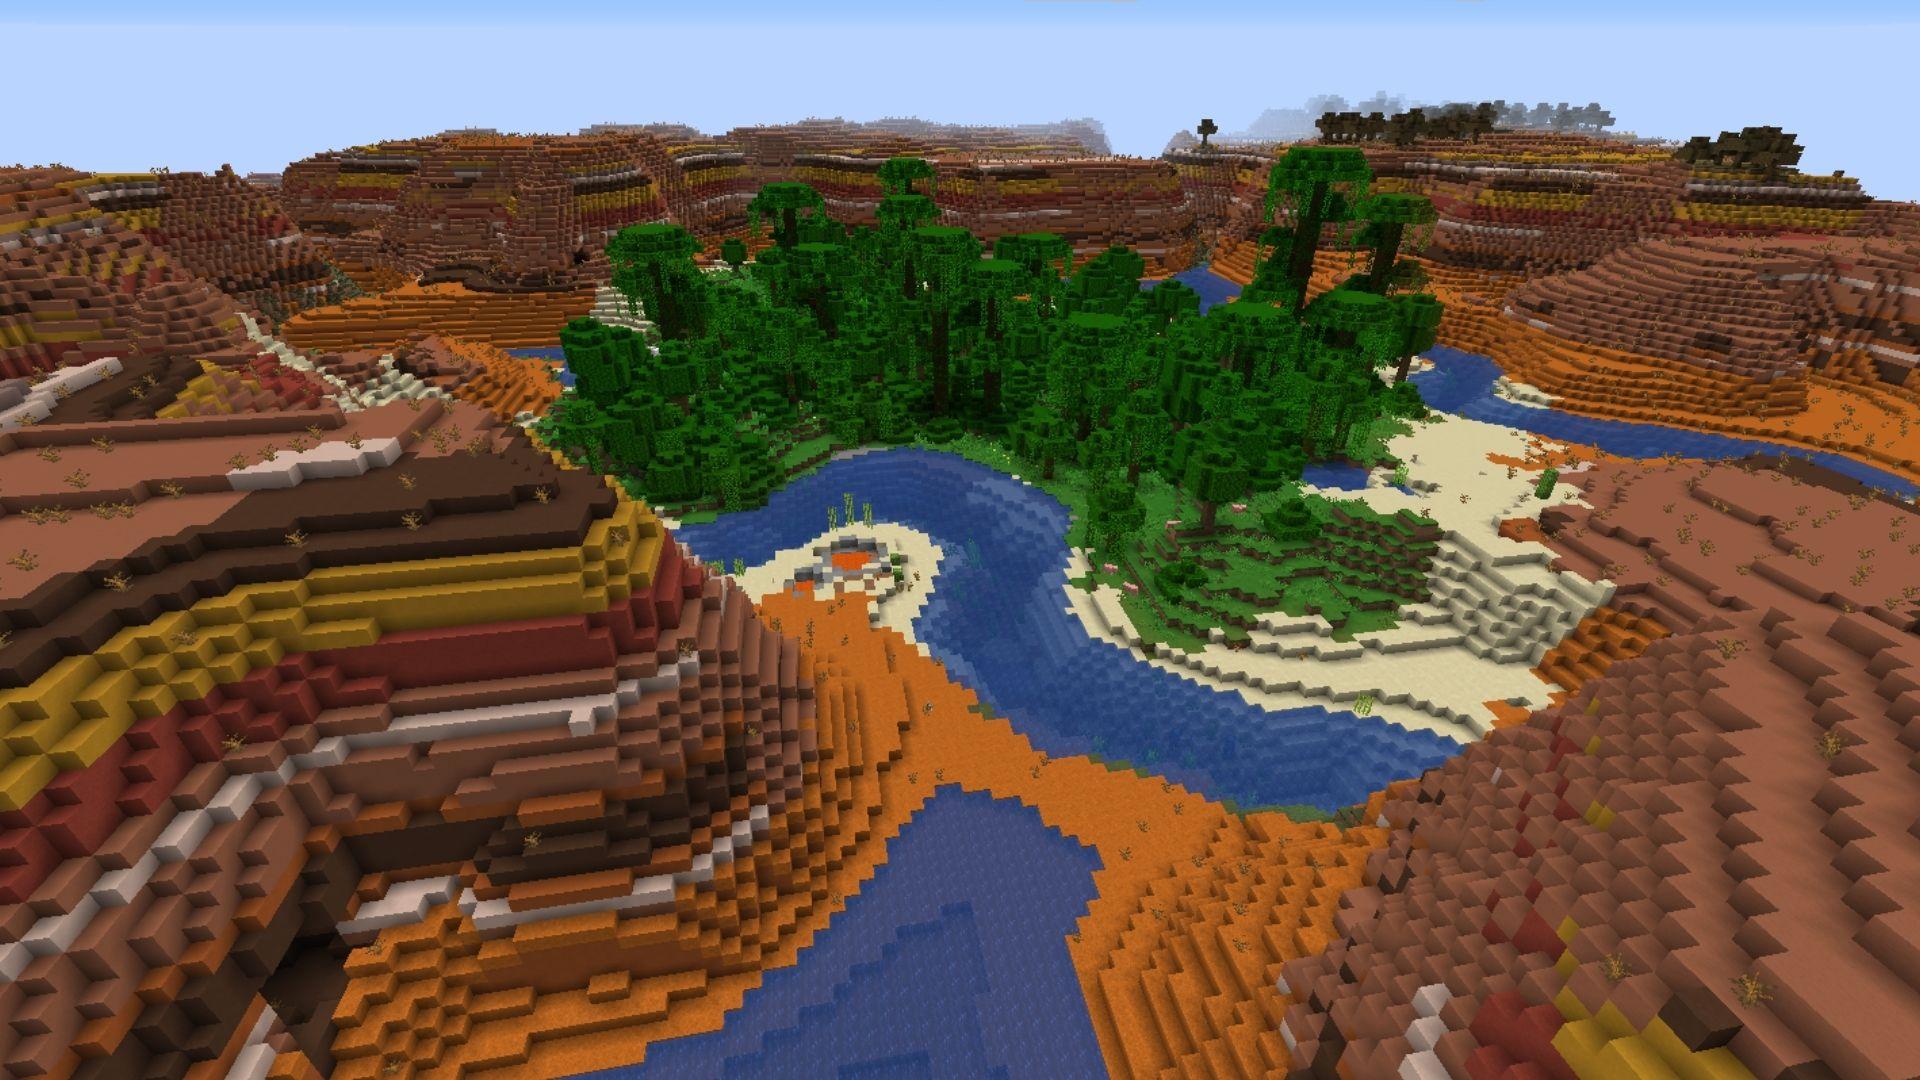 Jungle and desert biome